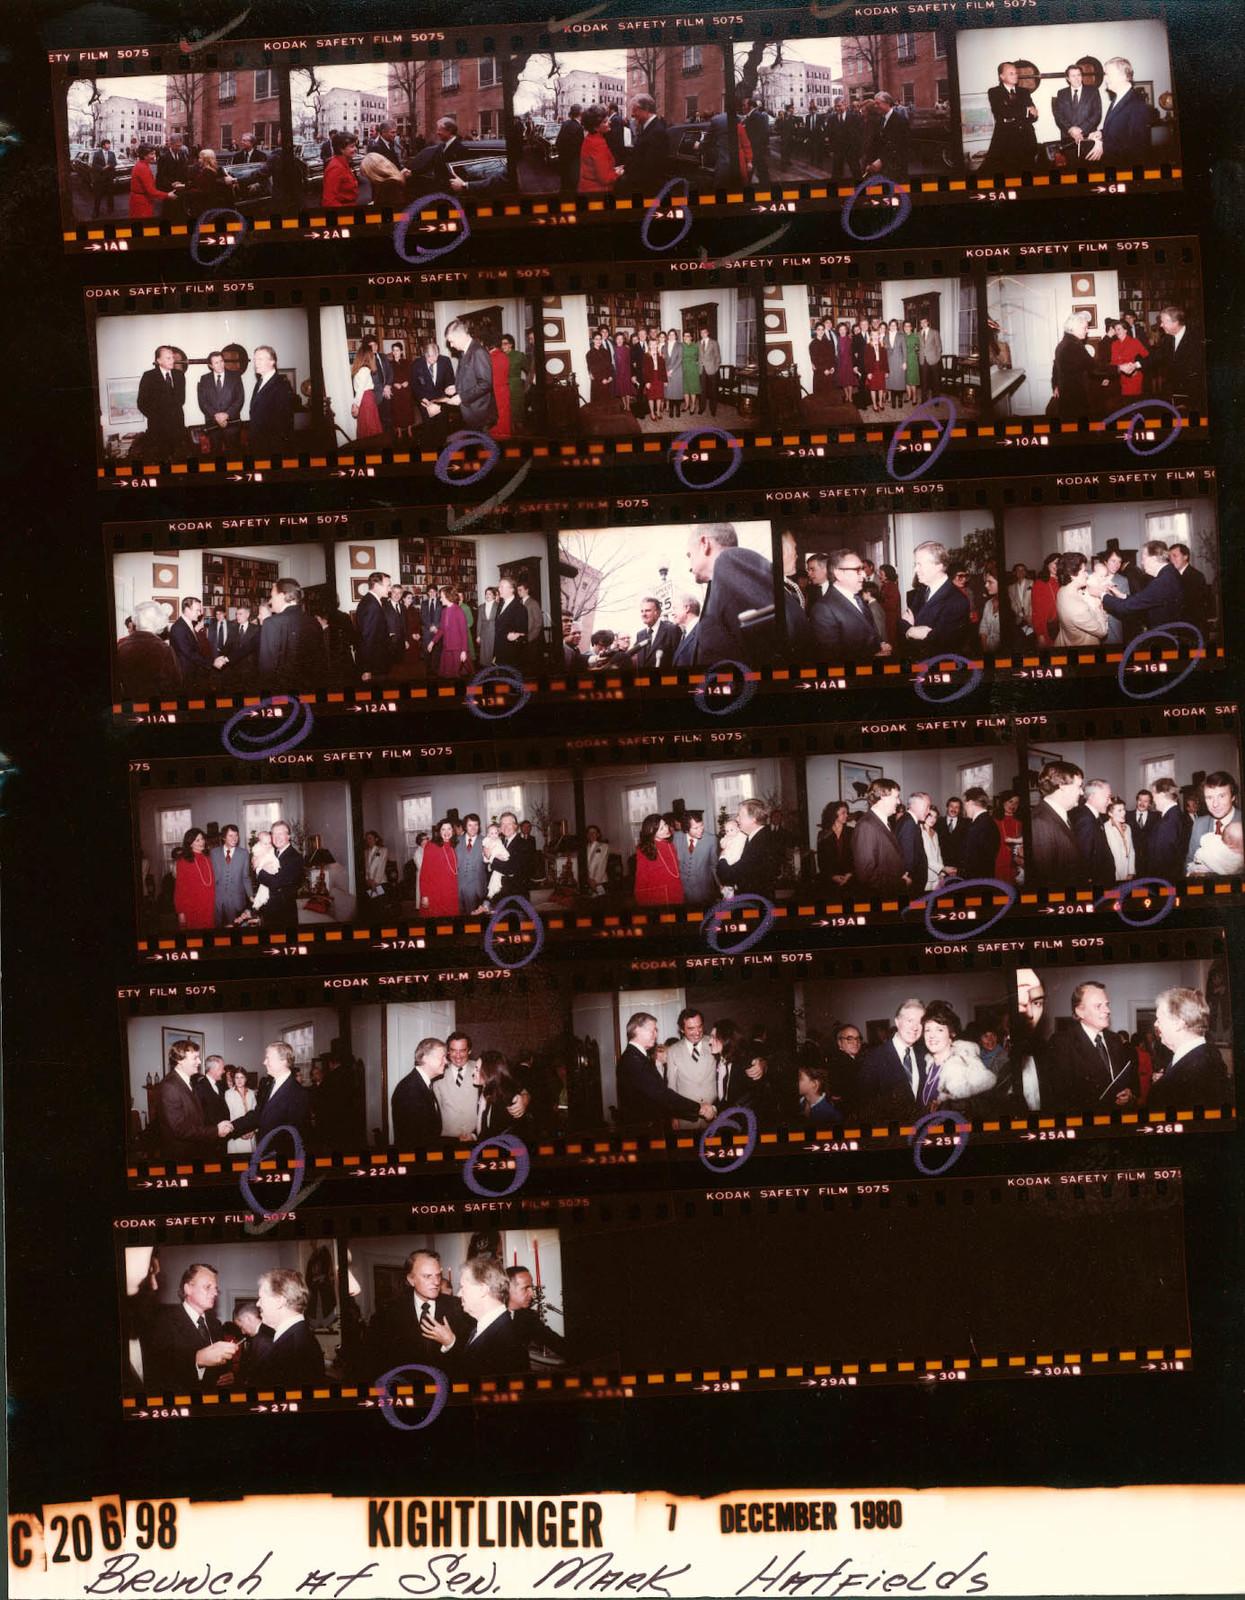 Jimmy Carter, Rosalynn Carter and Amy Carter - Brunch at Senator Mark Hatfield's home; Billy Graham, Fr. 6-7 & 26-28